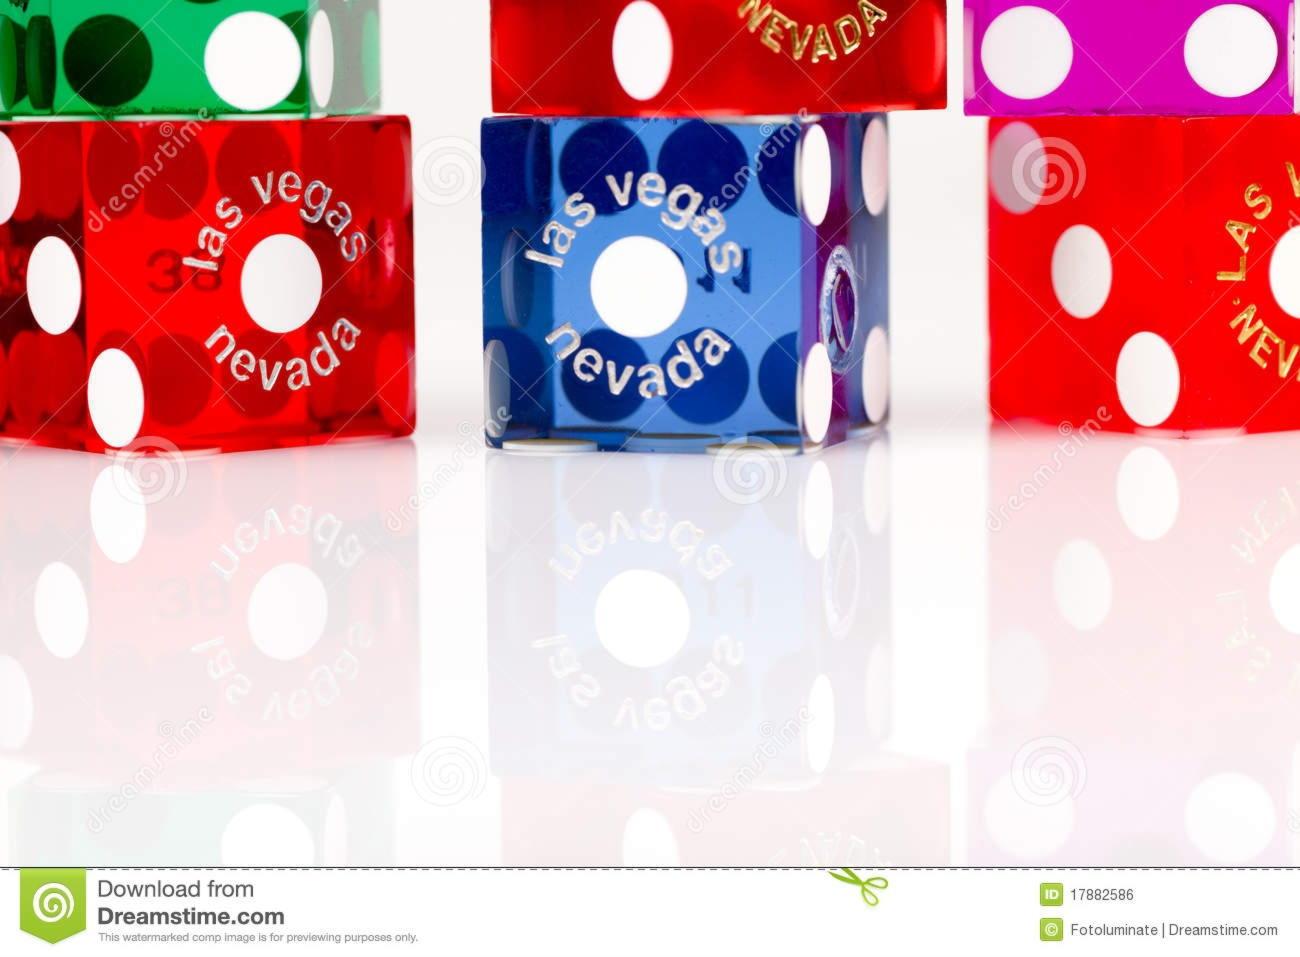 735% Signup Casino Bonus at Net Bet